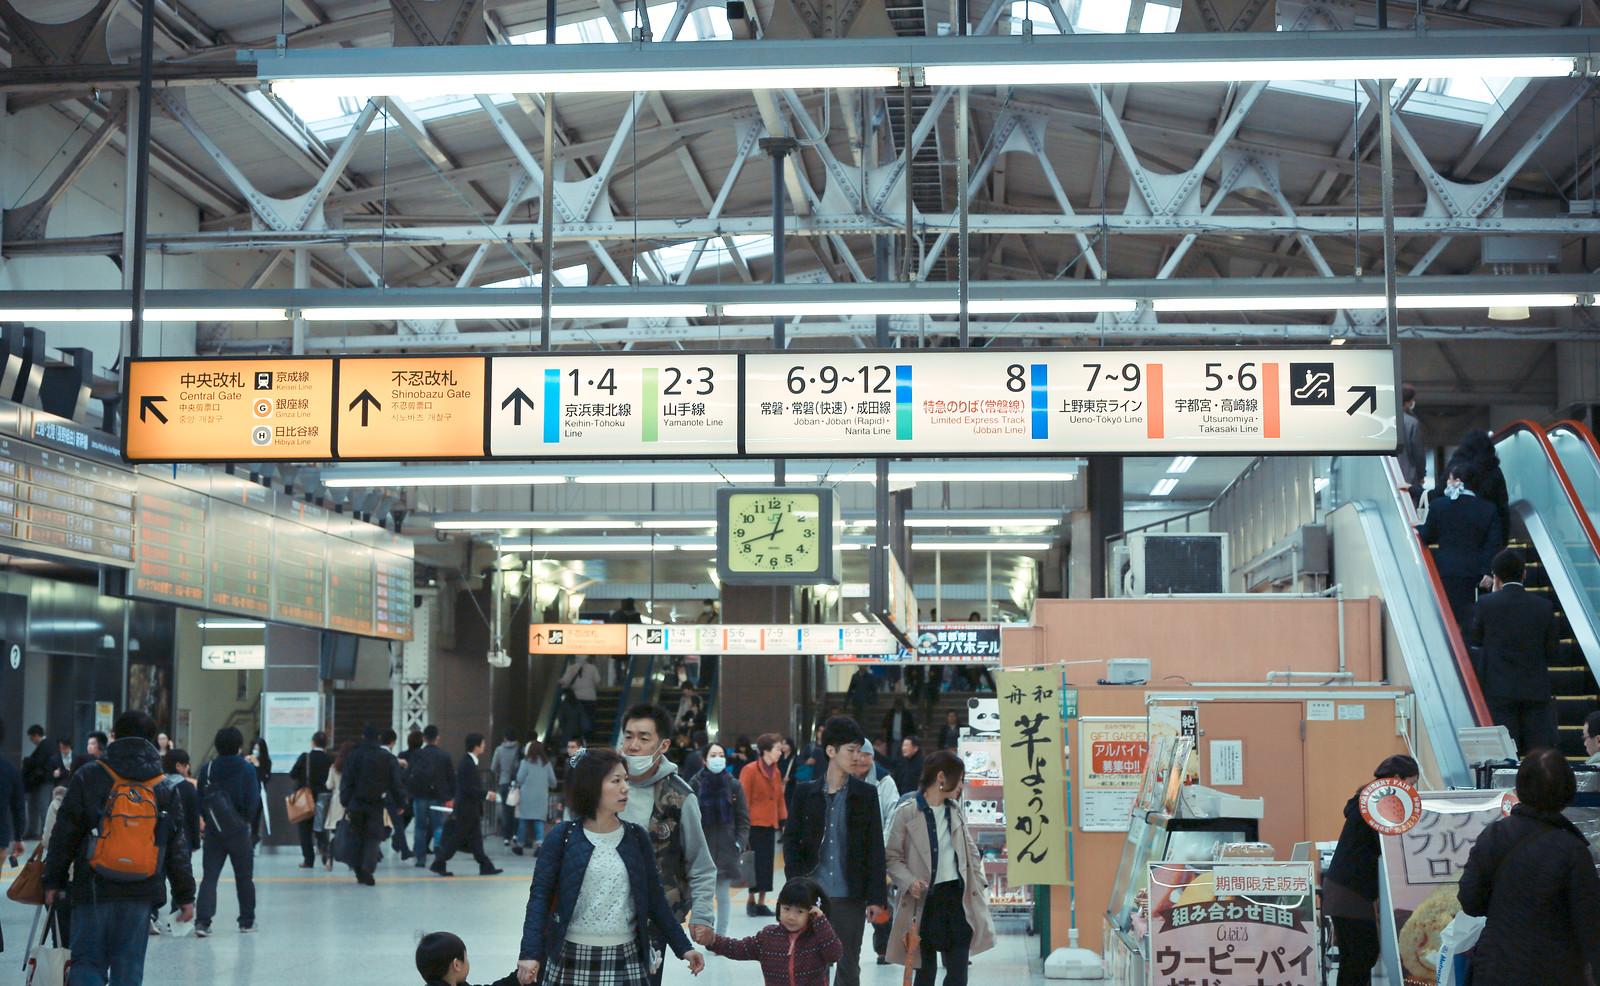 JR 上野駅 Ueno Station